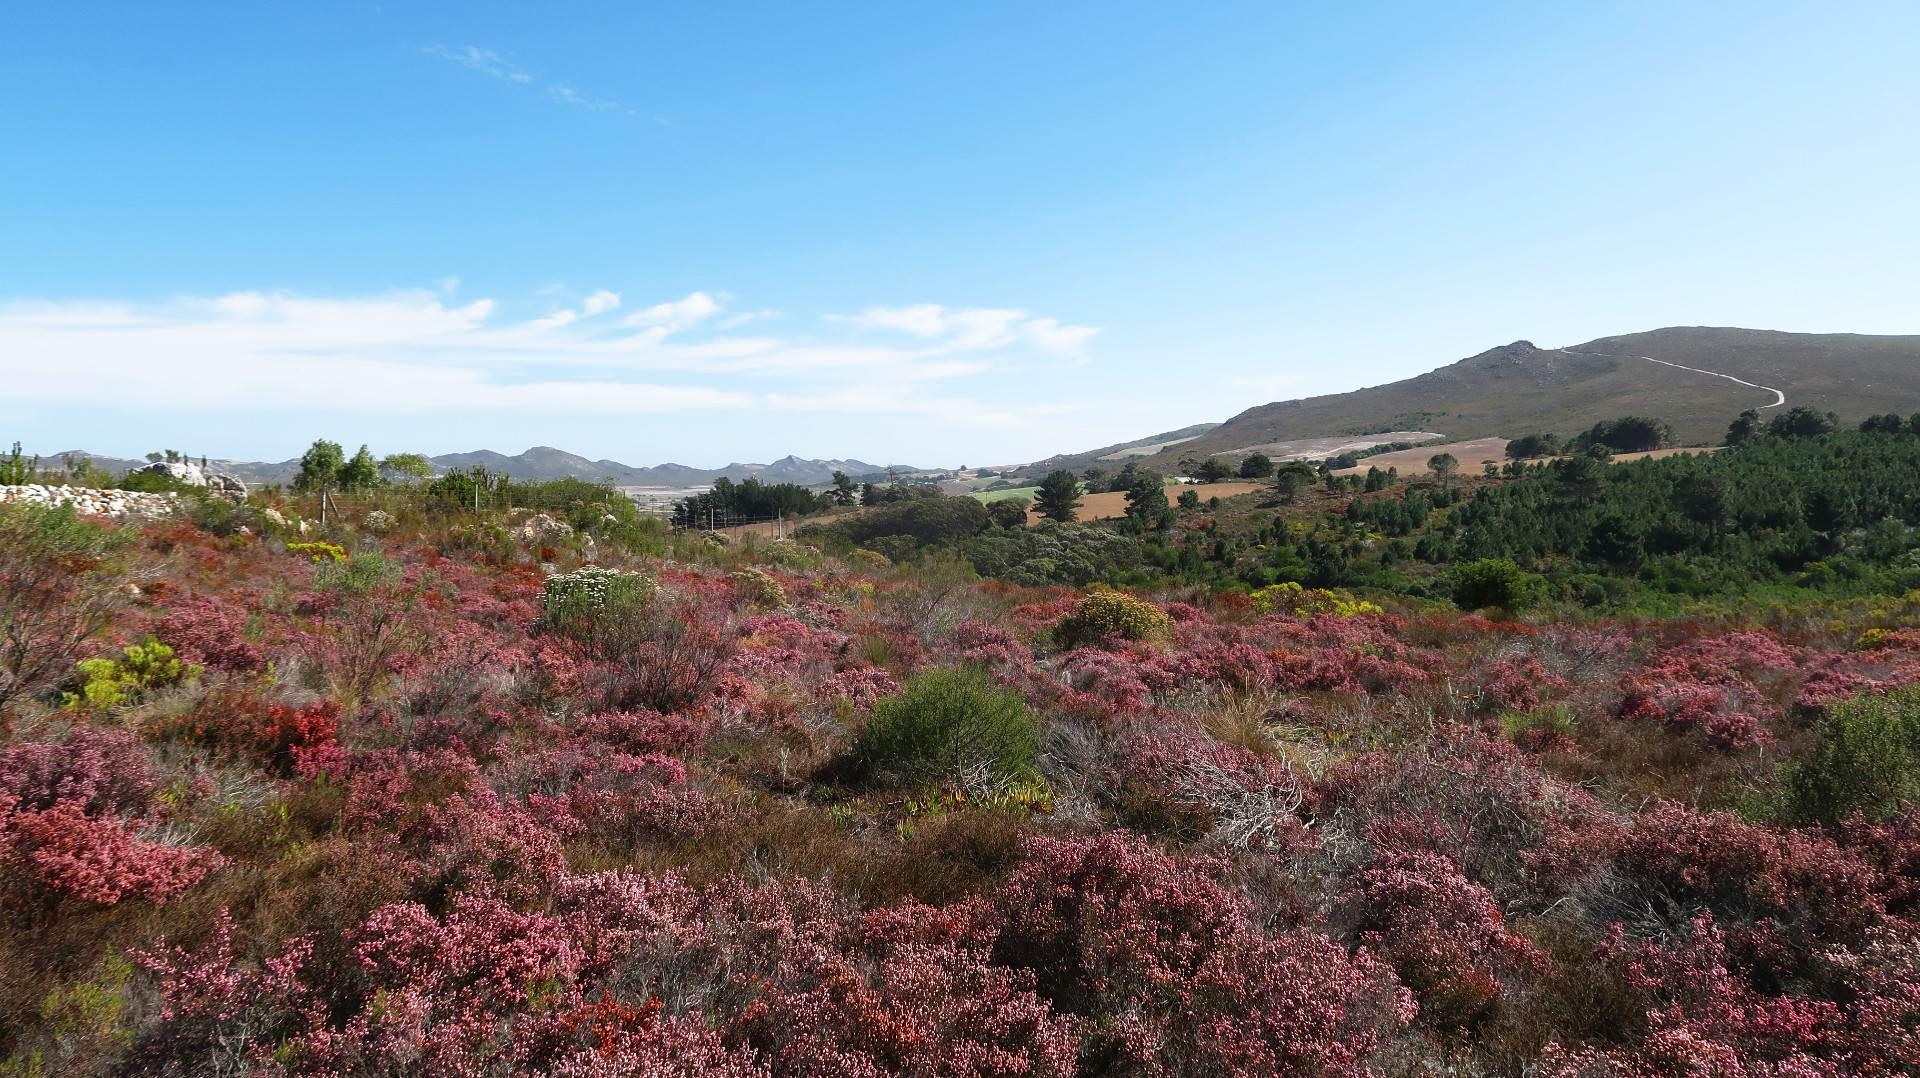 Facing West into the Baardskeerdersbos Valley